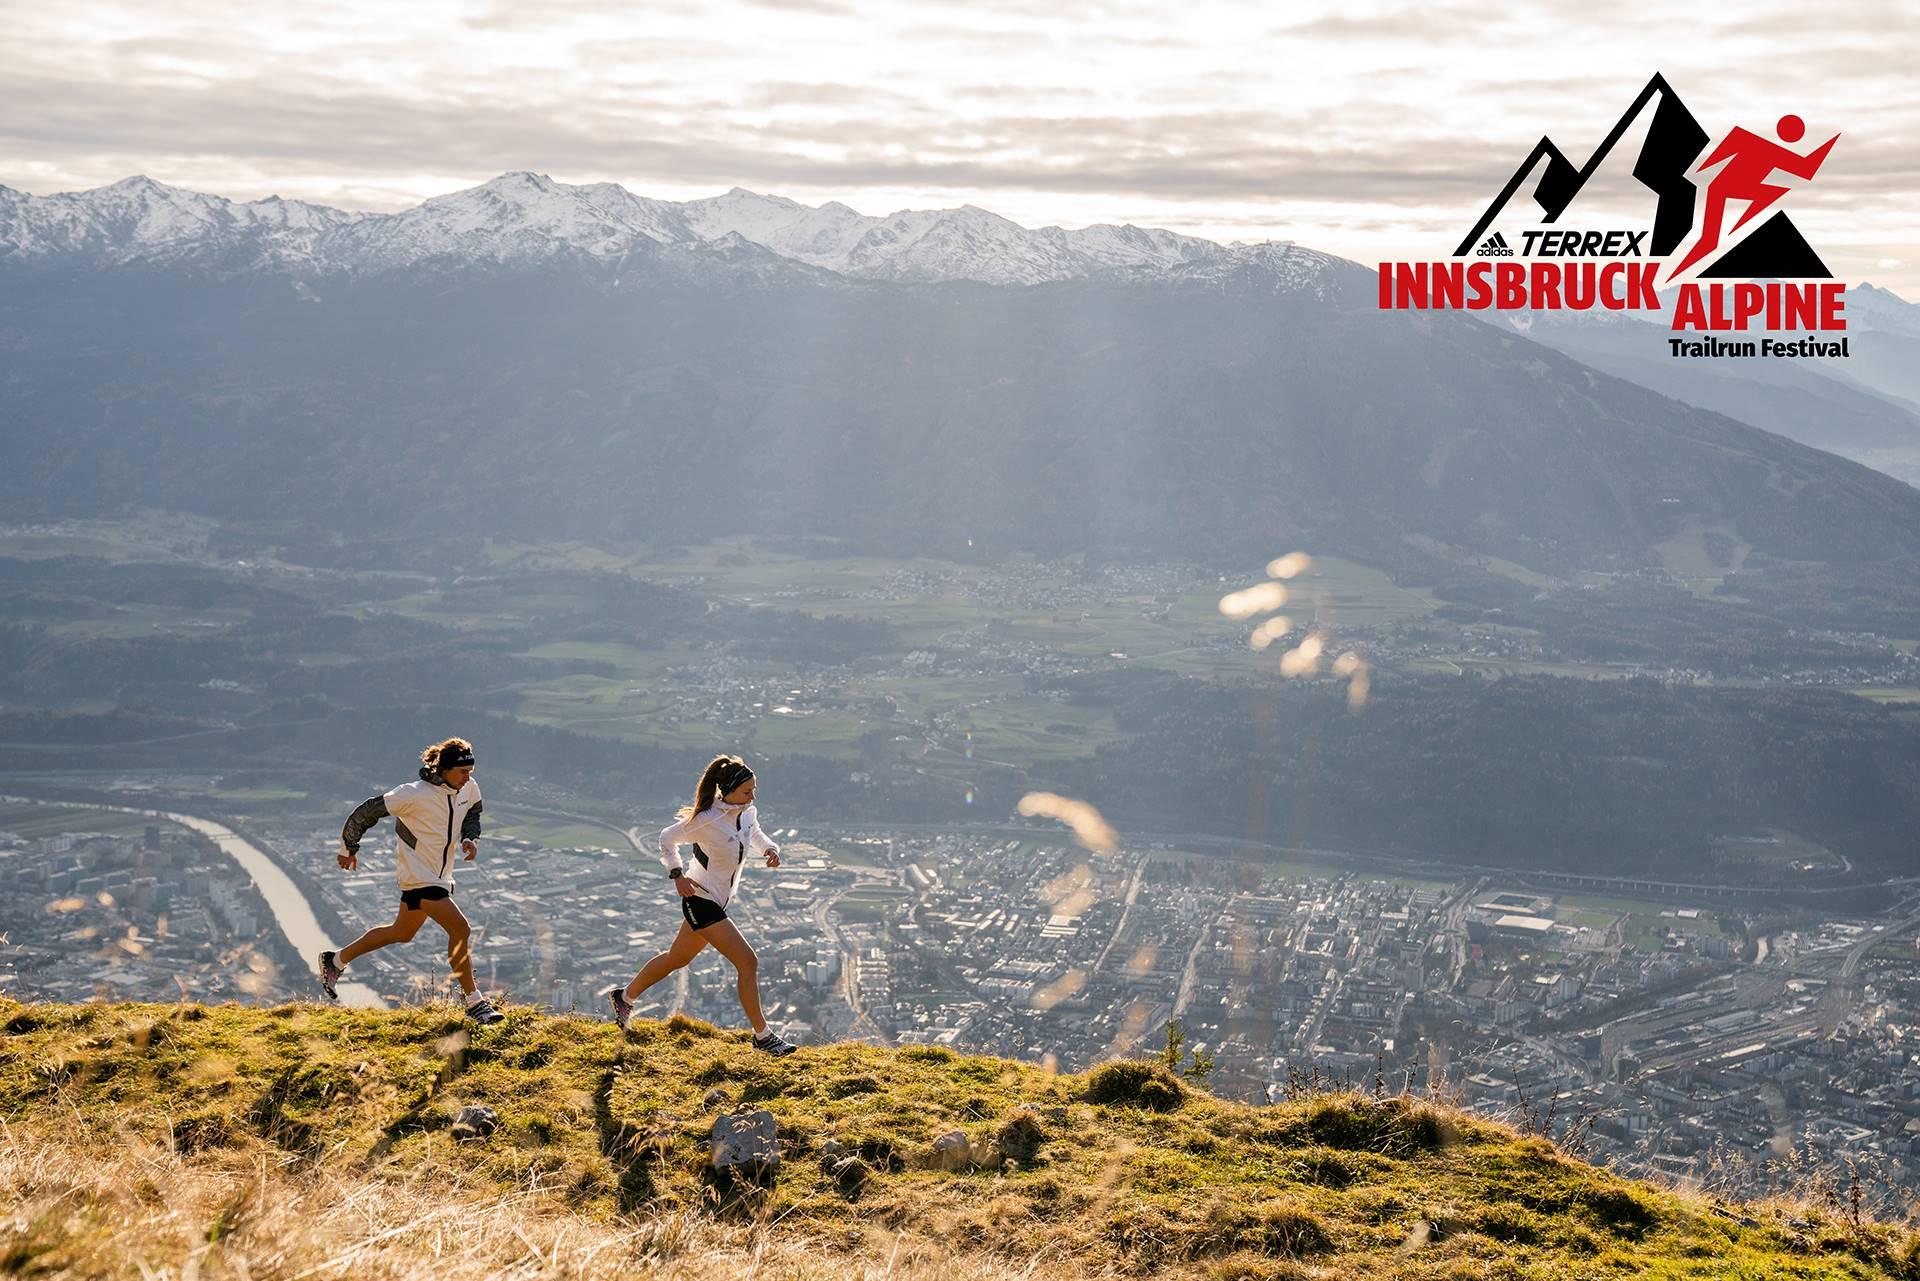 Innsbruck Alpine Trailrun fesztival 2021-1